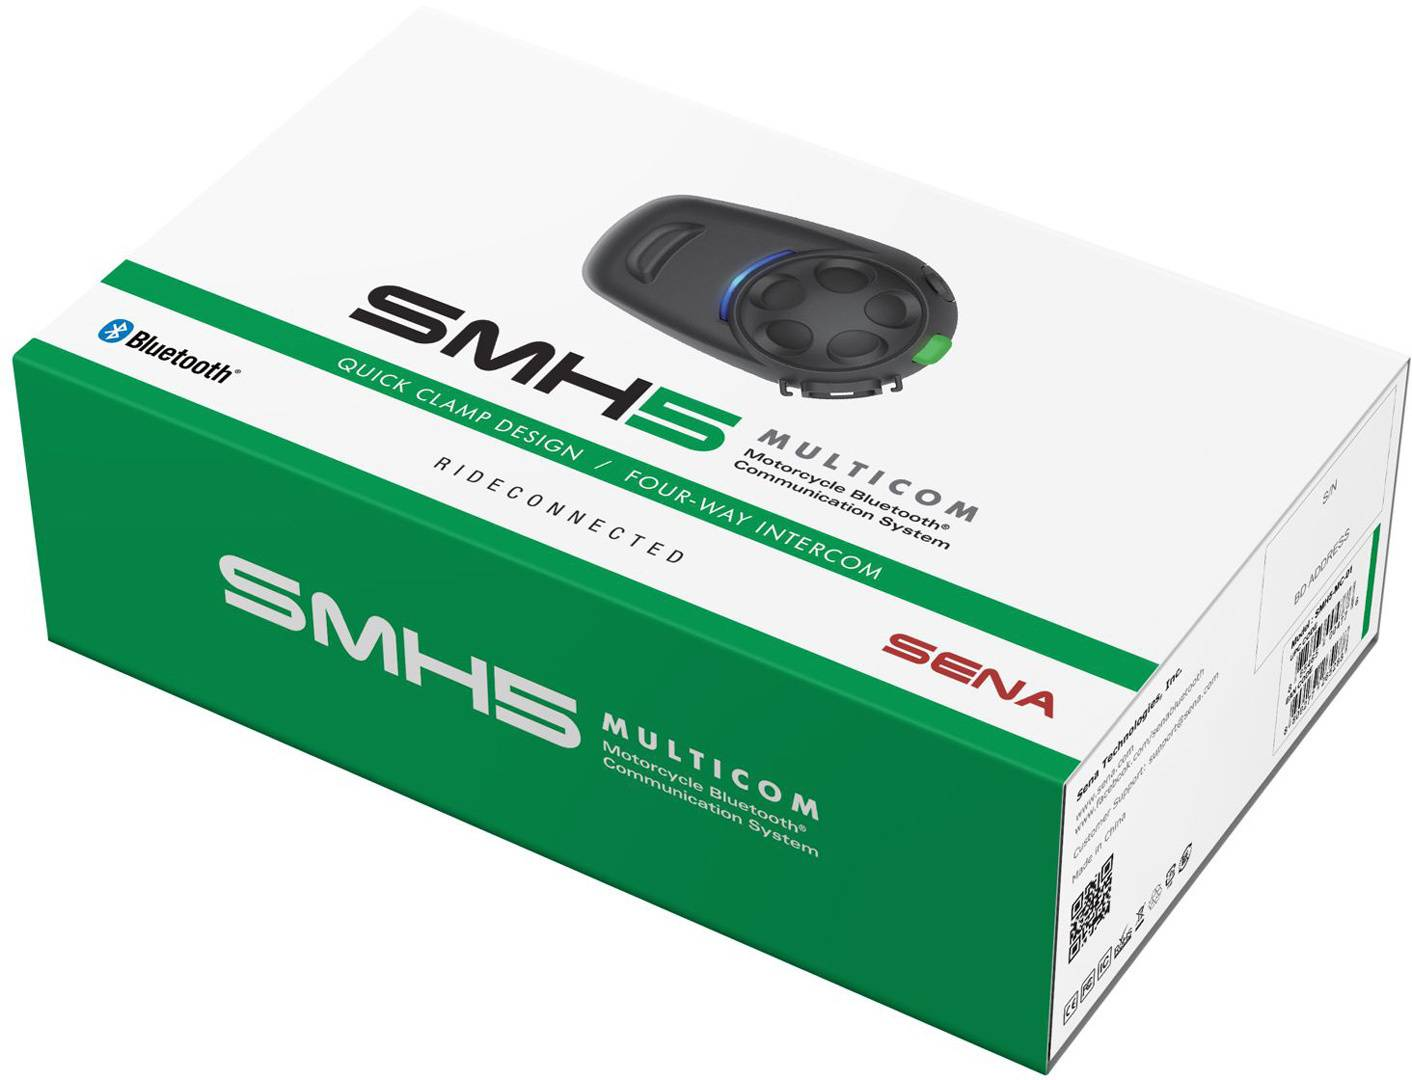 Sena SMH5 Multicom Bluetooth Communication System Single Pack Pacchetto singolo sistema di comunicazione Bluetooth